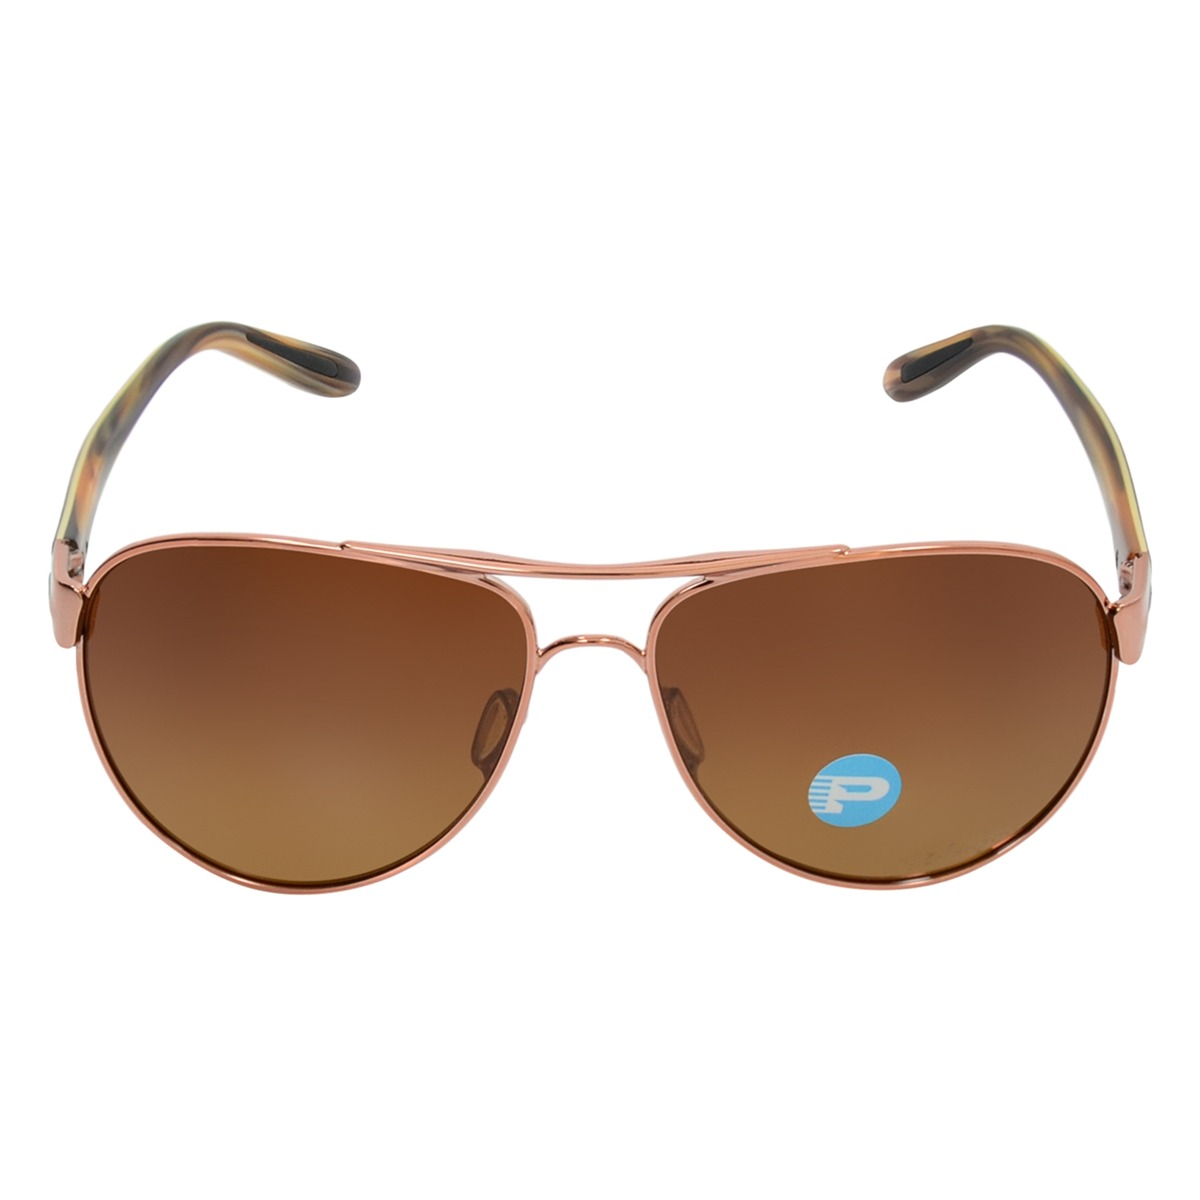 de3668a33 óculos feminino oakley disclosure rose gold polarizado. Carregando zoom.